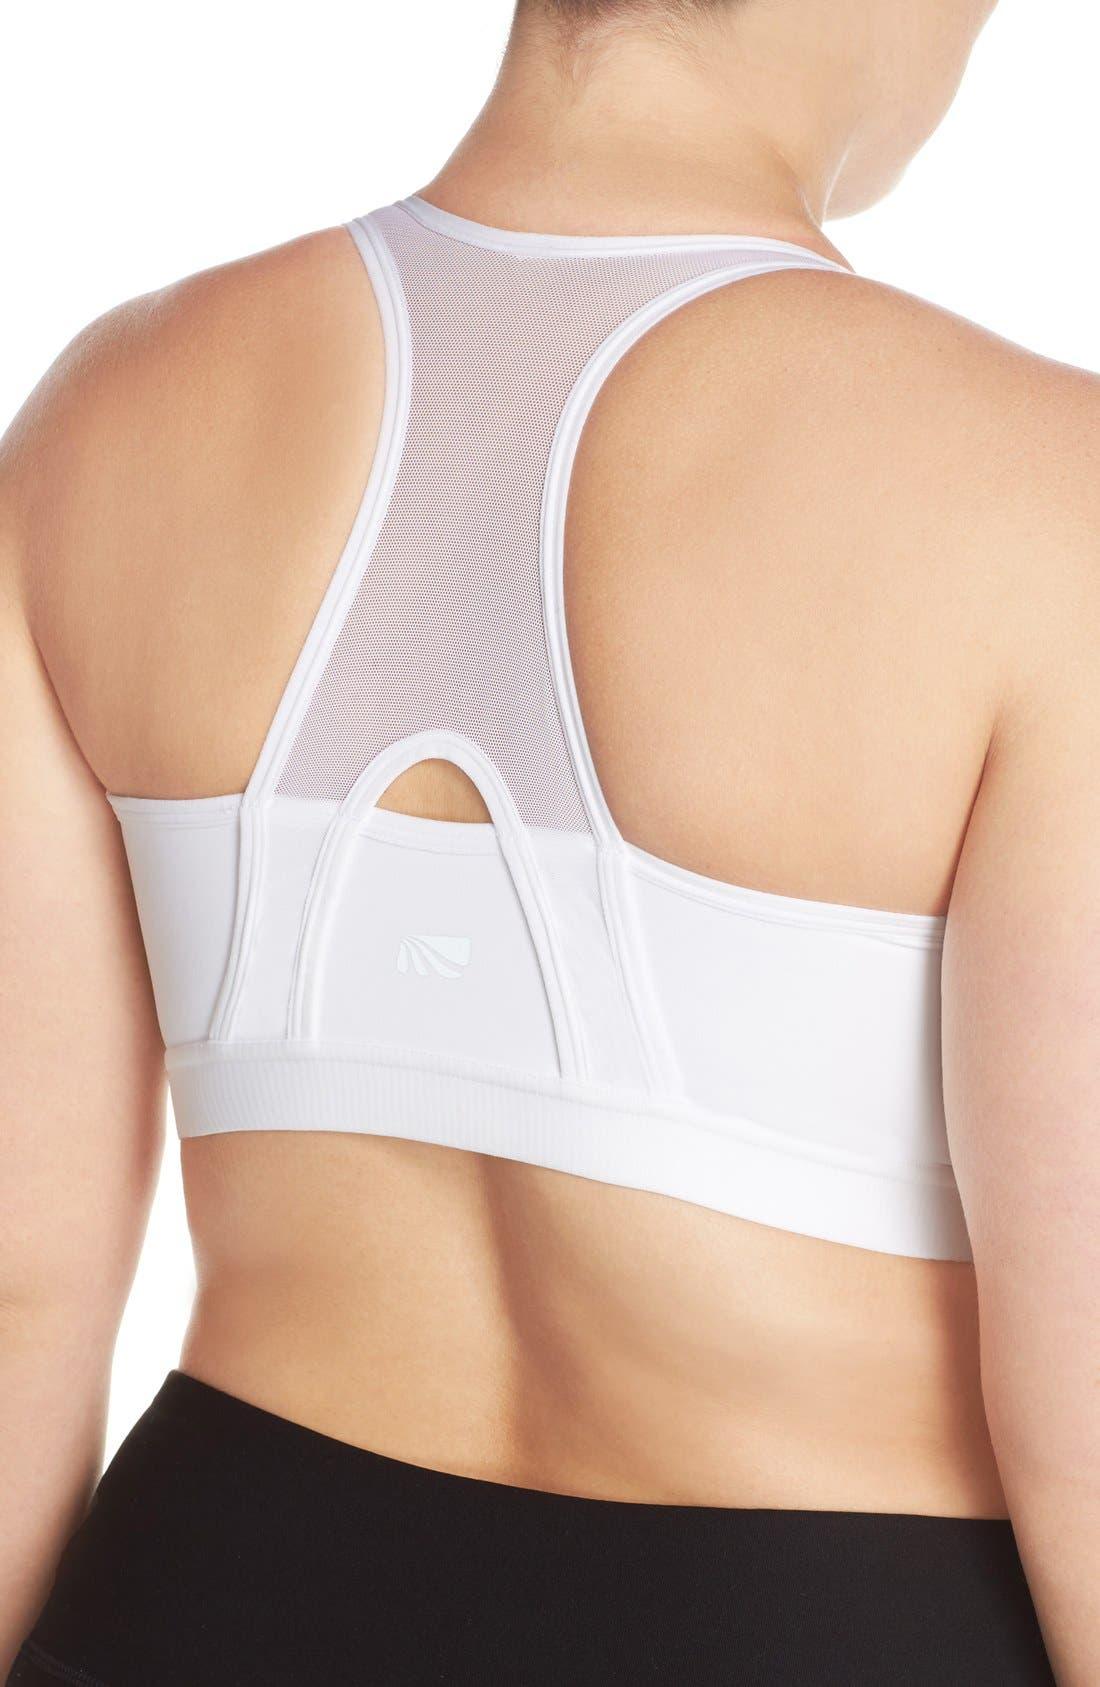 Alternate Image 2  - Marika Curves 'Sierra' Underwire Sports Bra (Plus Size)